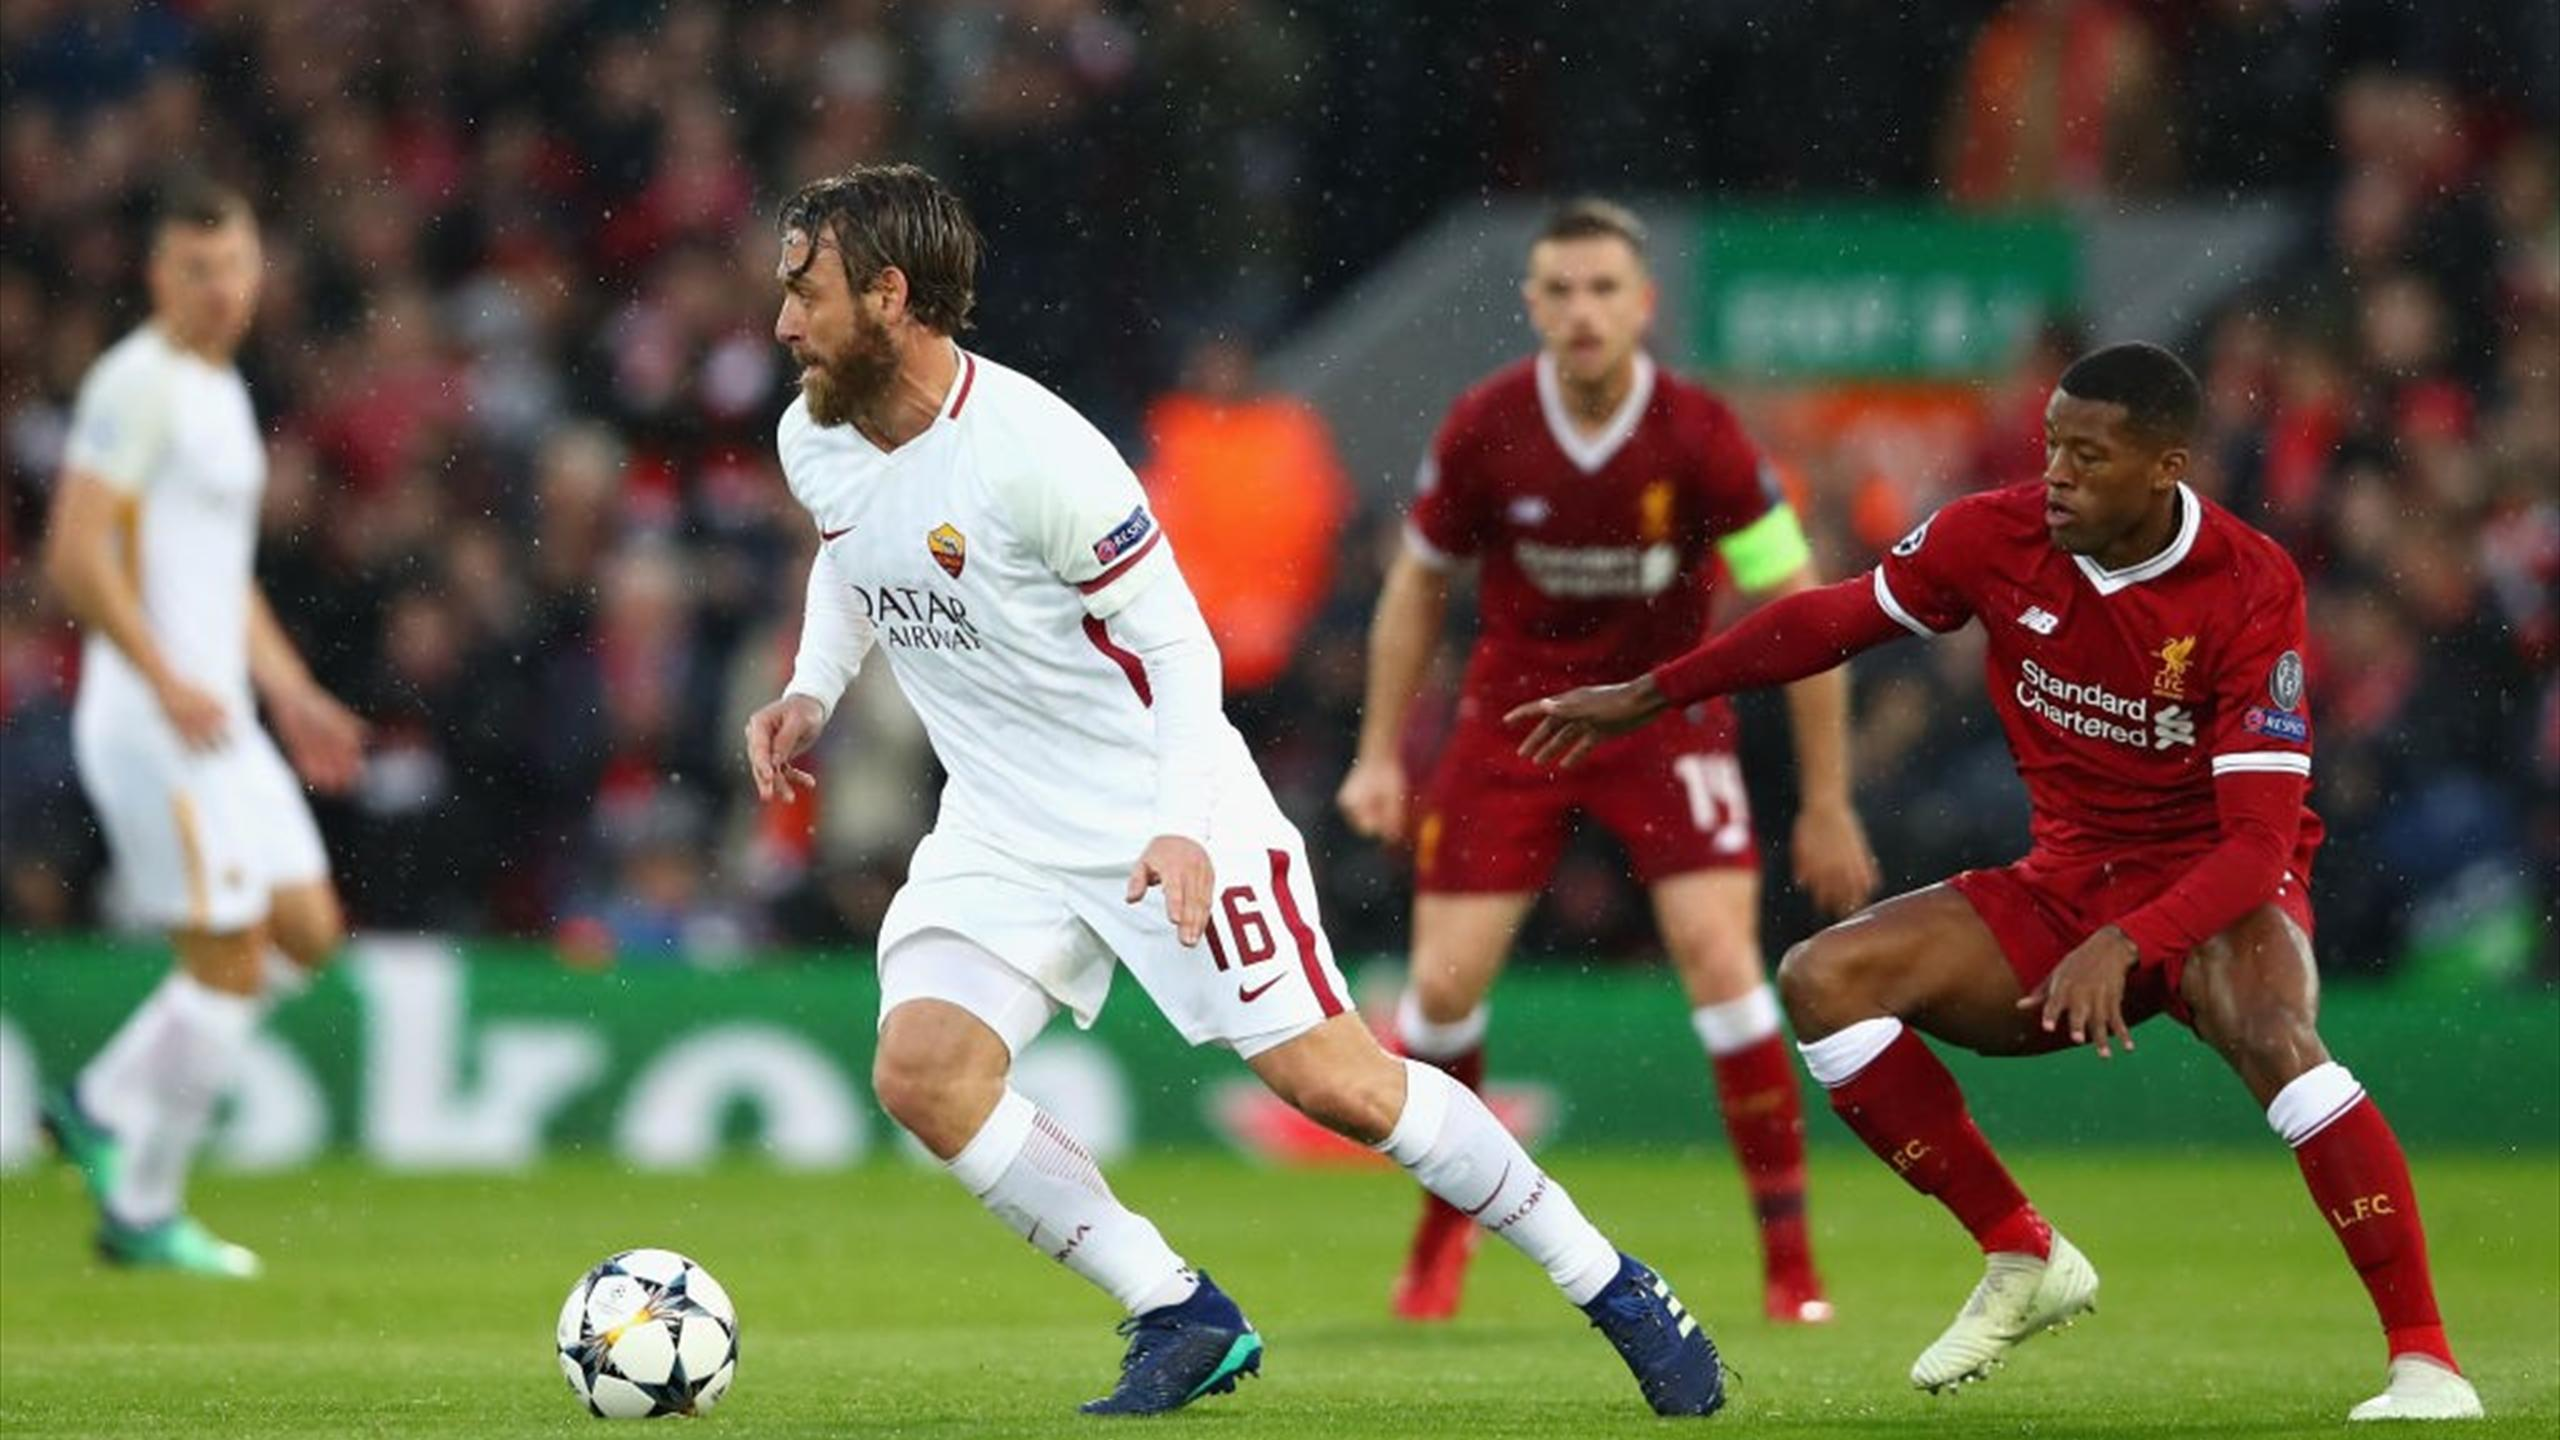 Roma Liverpool Live